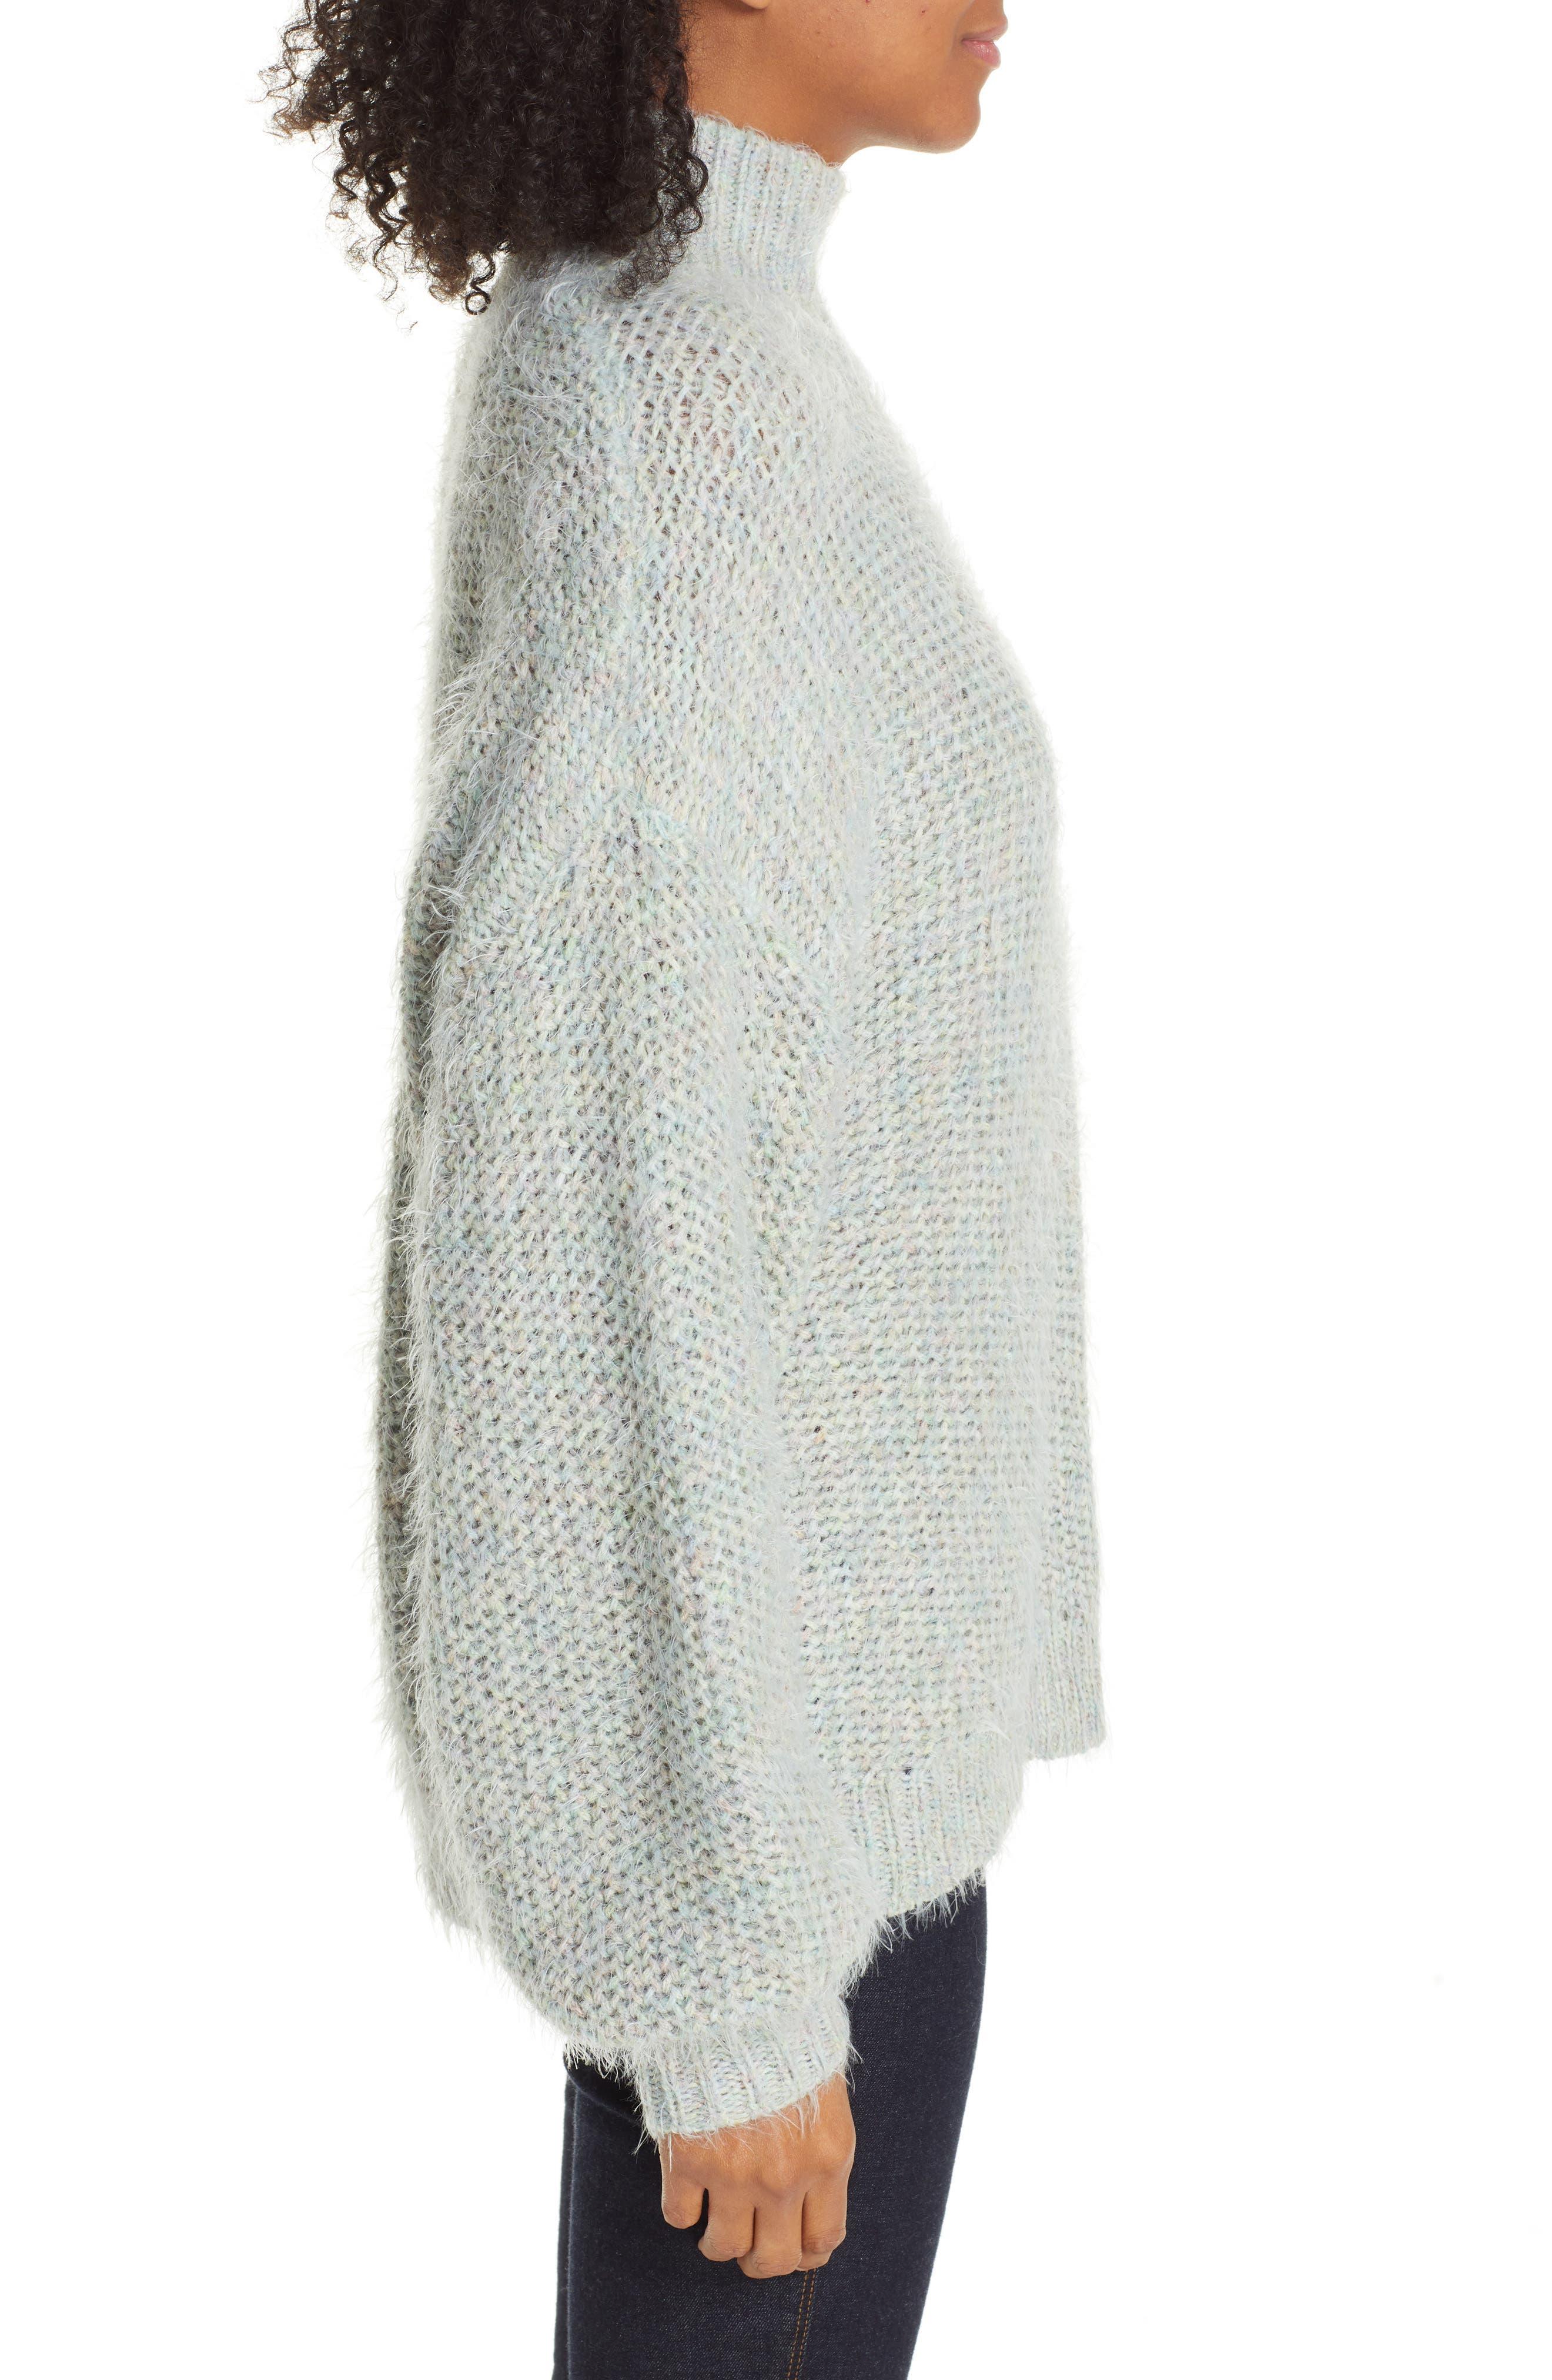 Markita Sweater,                             Alternate thumbnail 3, color,                             HEATHER CELADON